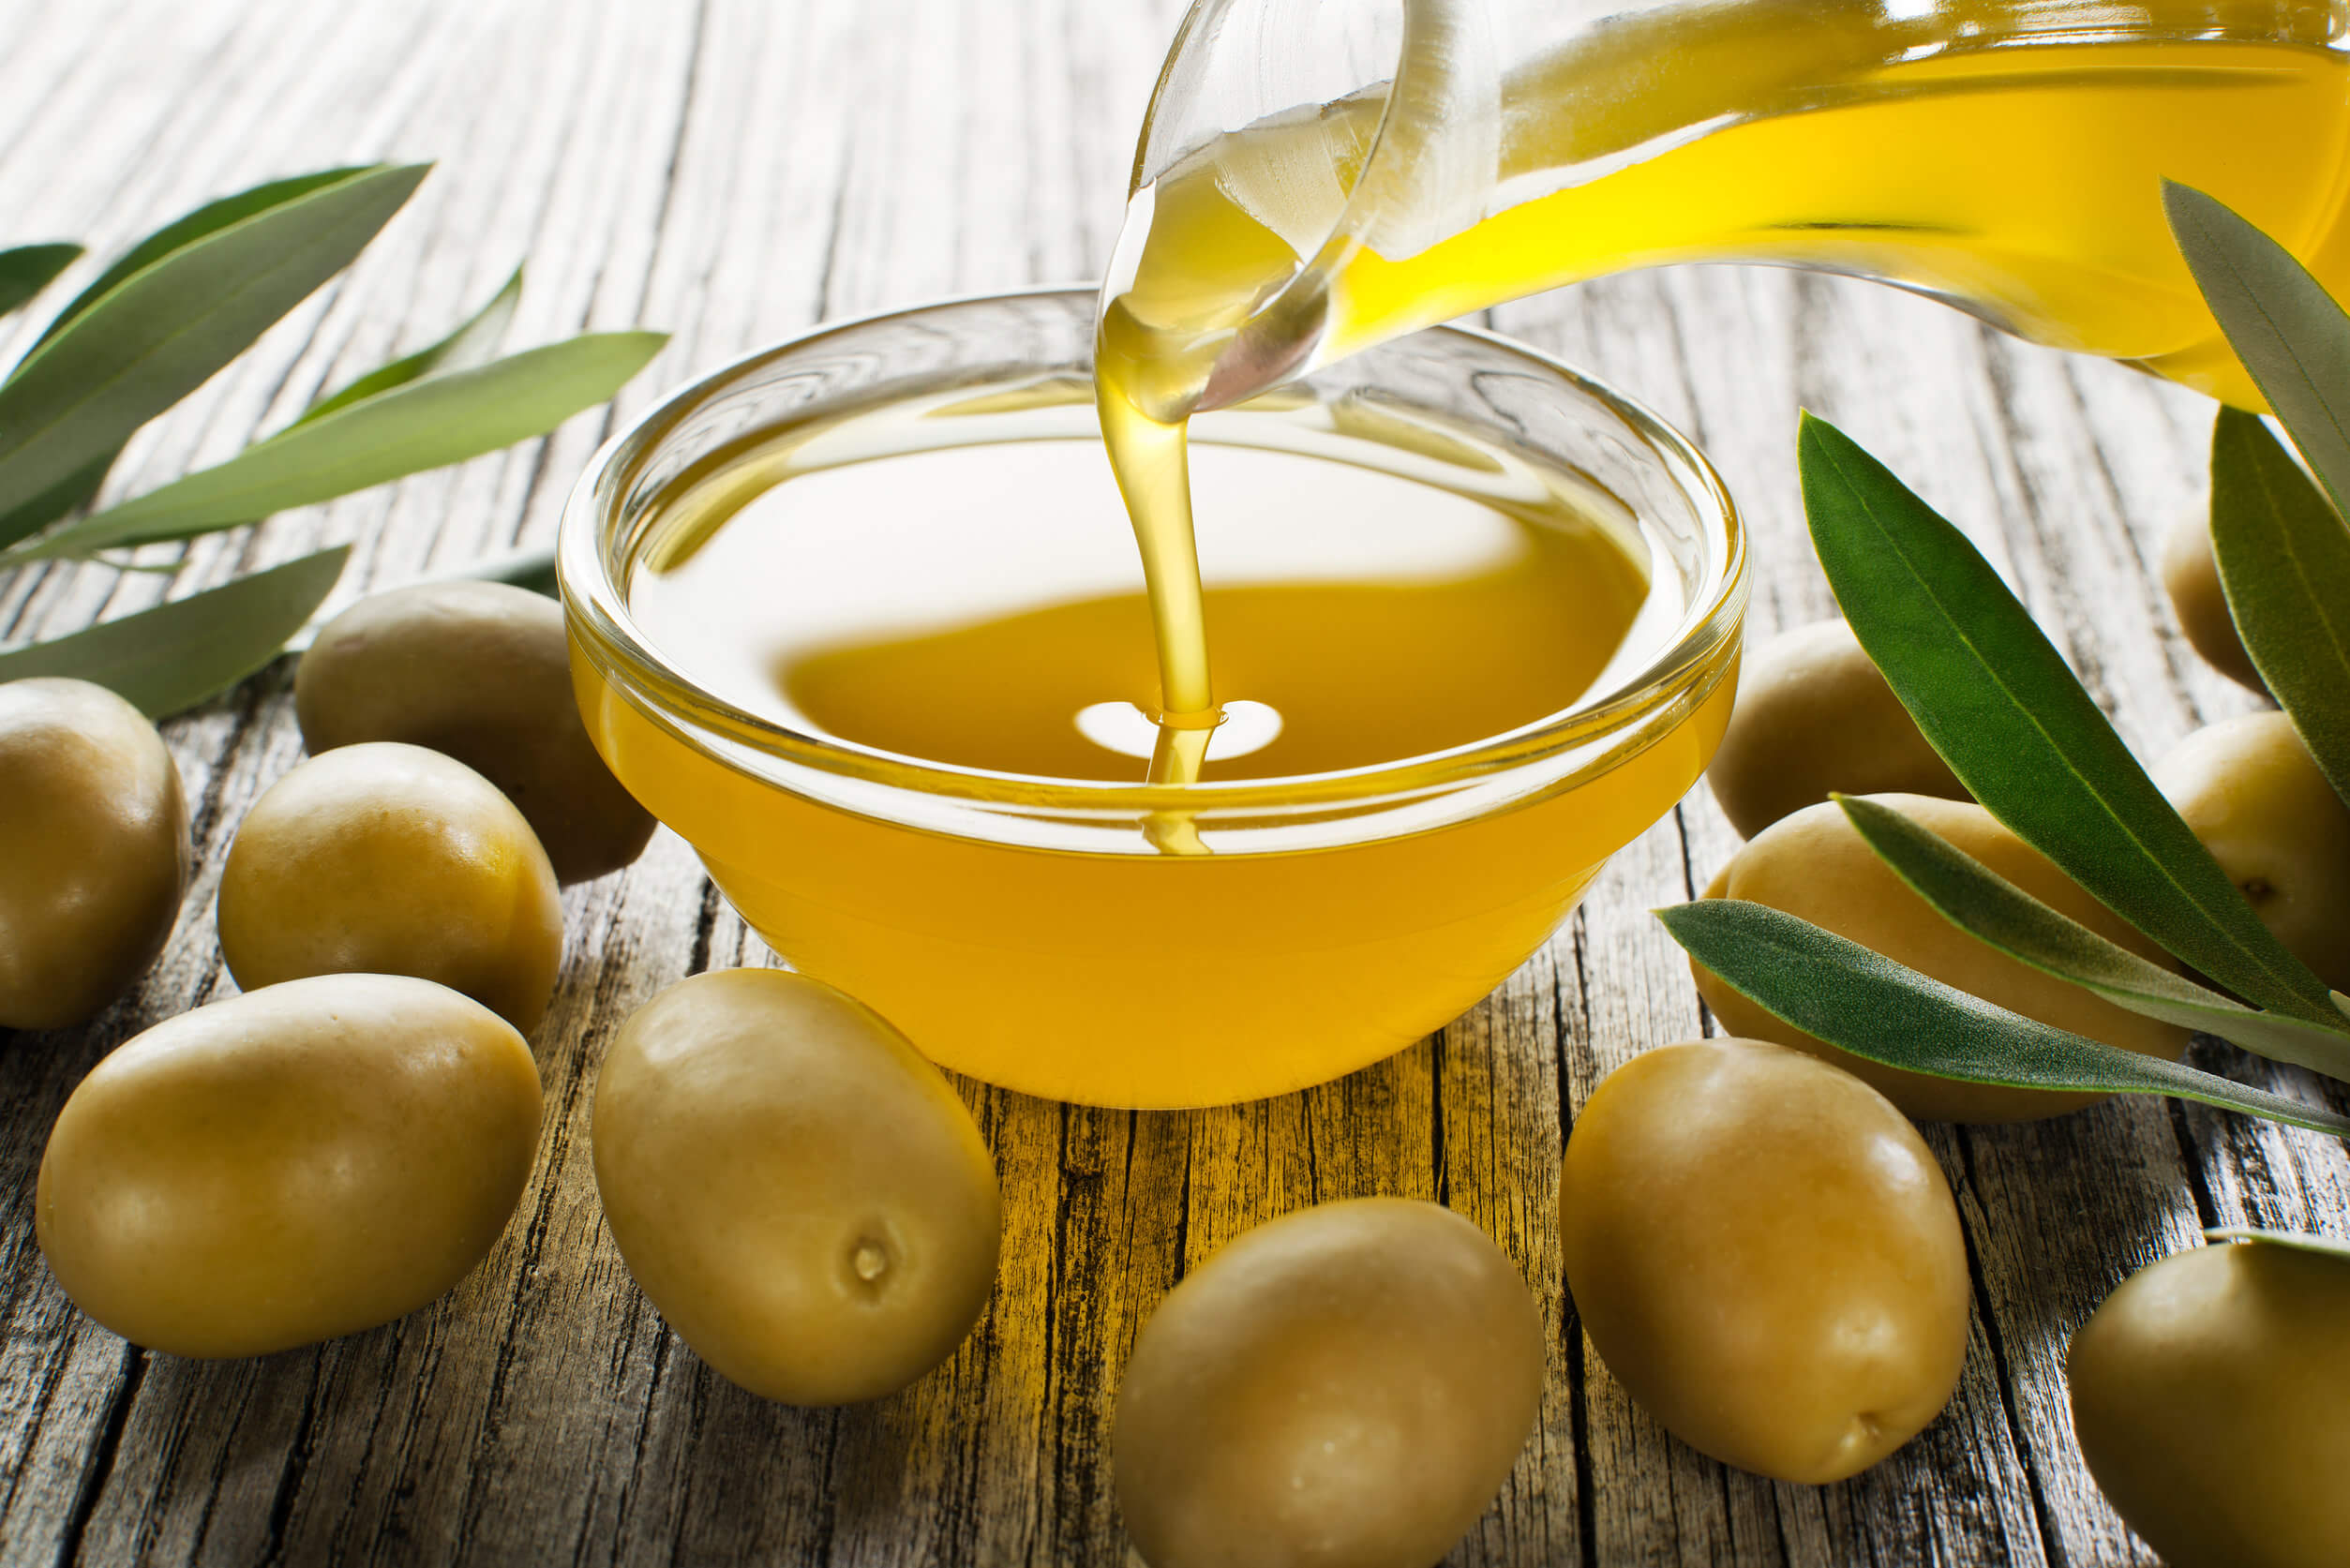 Sustituye la mantequilla por aceite de oliva